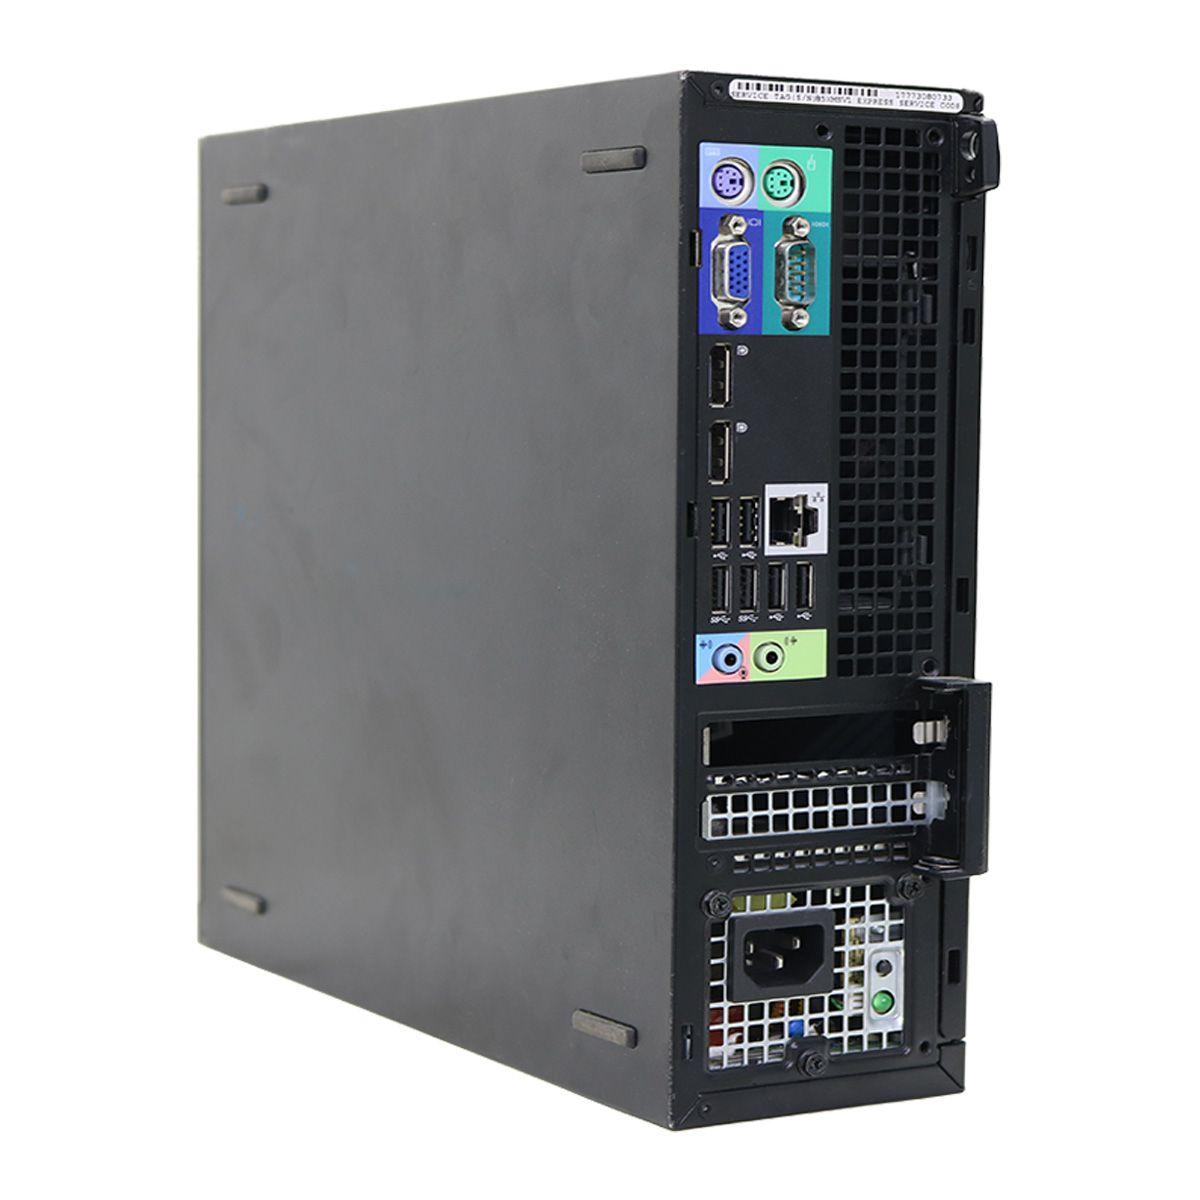 Desktop dell optiplex 7010 mini i7 (3770) 8gb 2tb  - usado